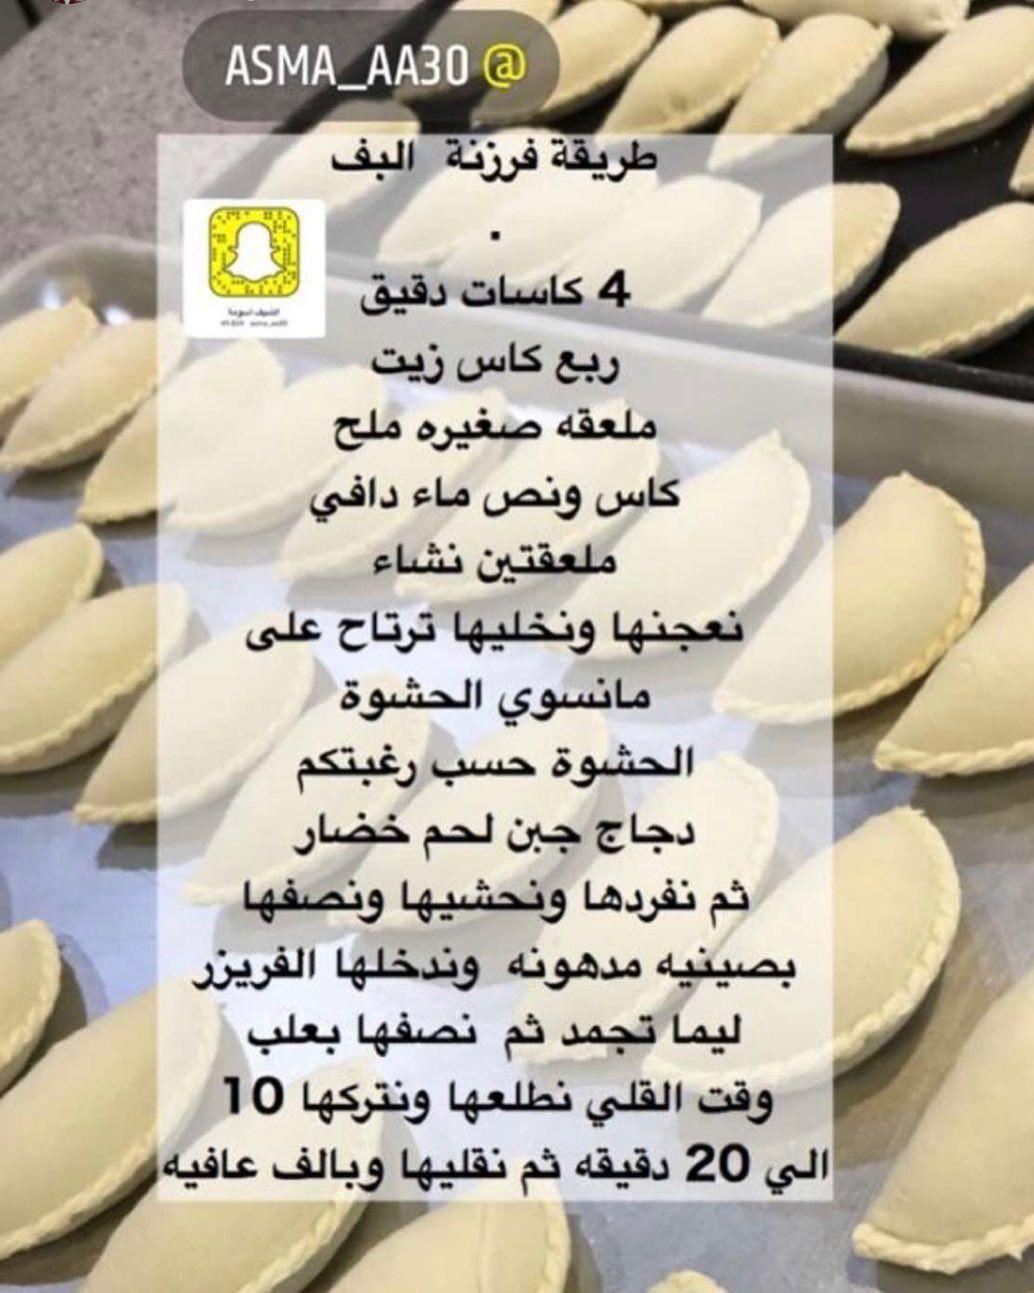 29 Likes 0 Comments وصفات رمضانيه Cook Zizi On Instagram Food Cooking Fruit